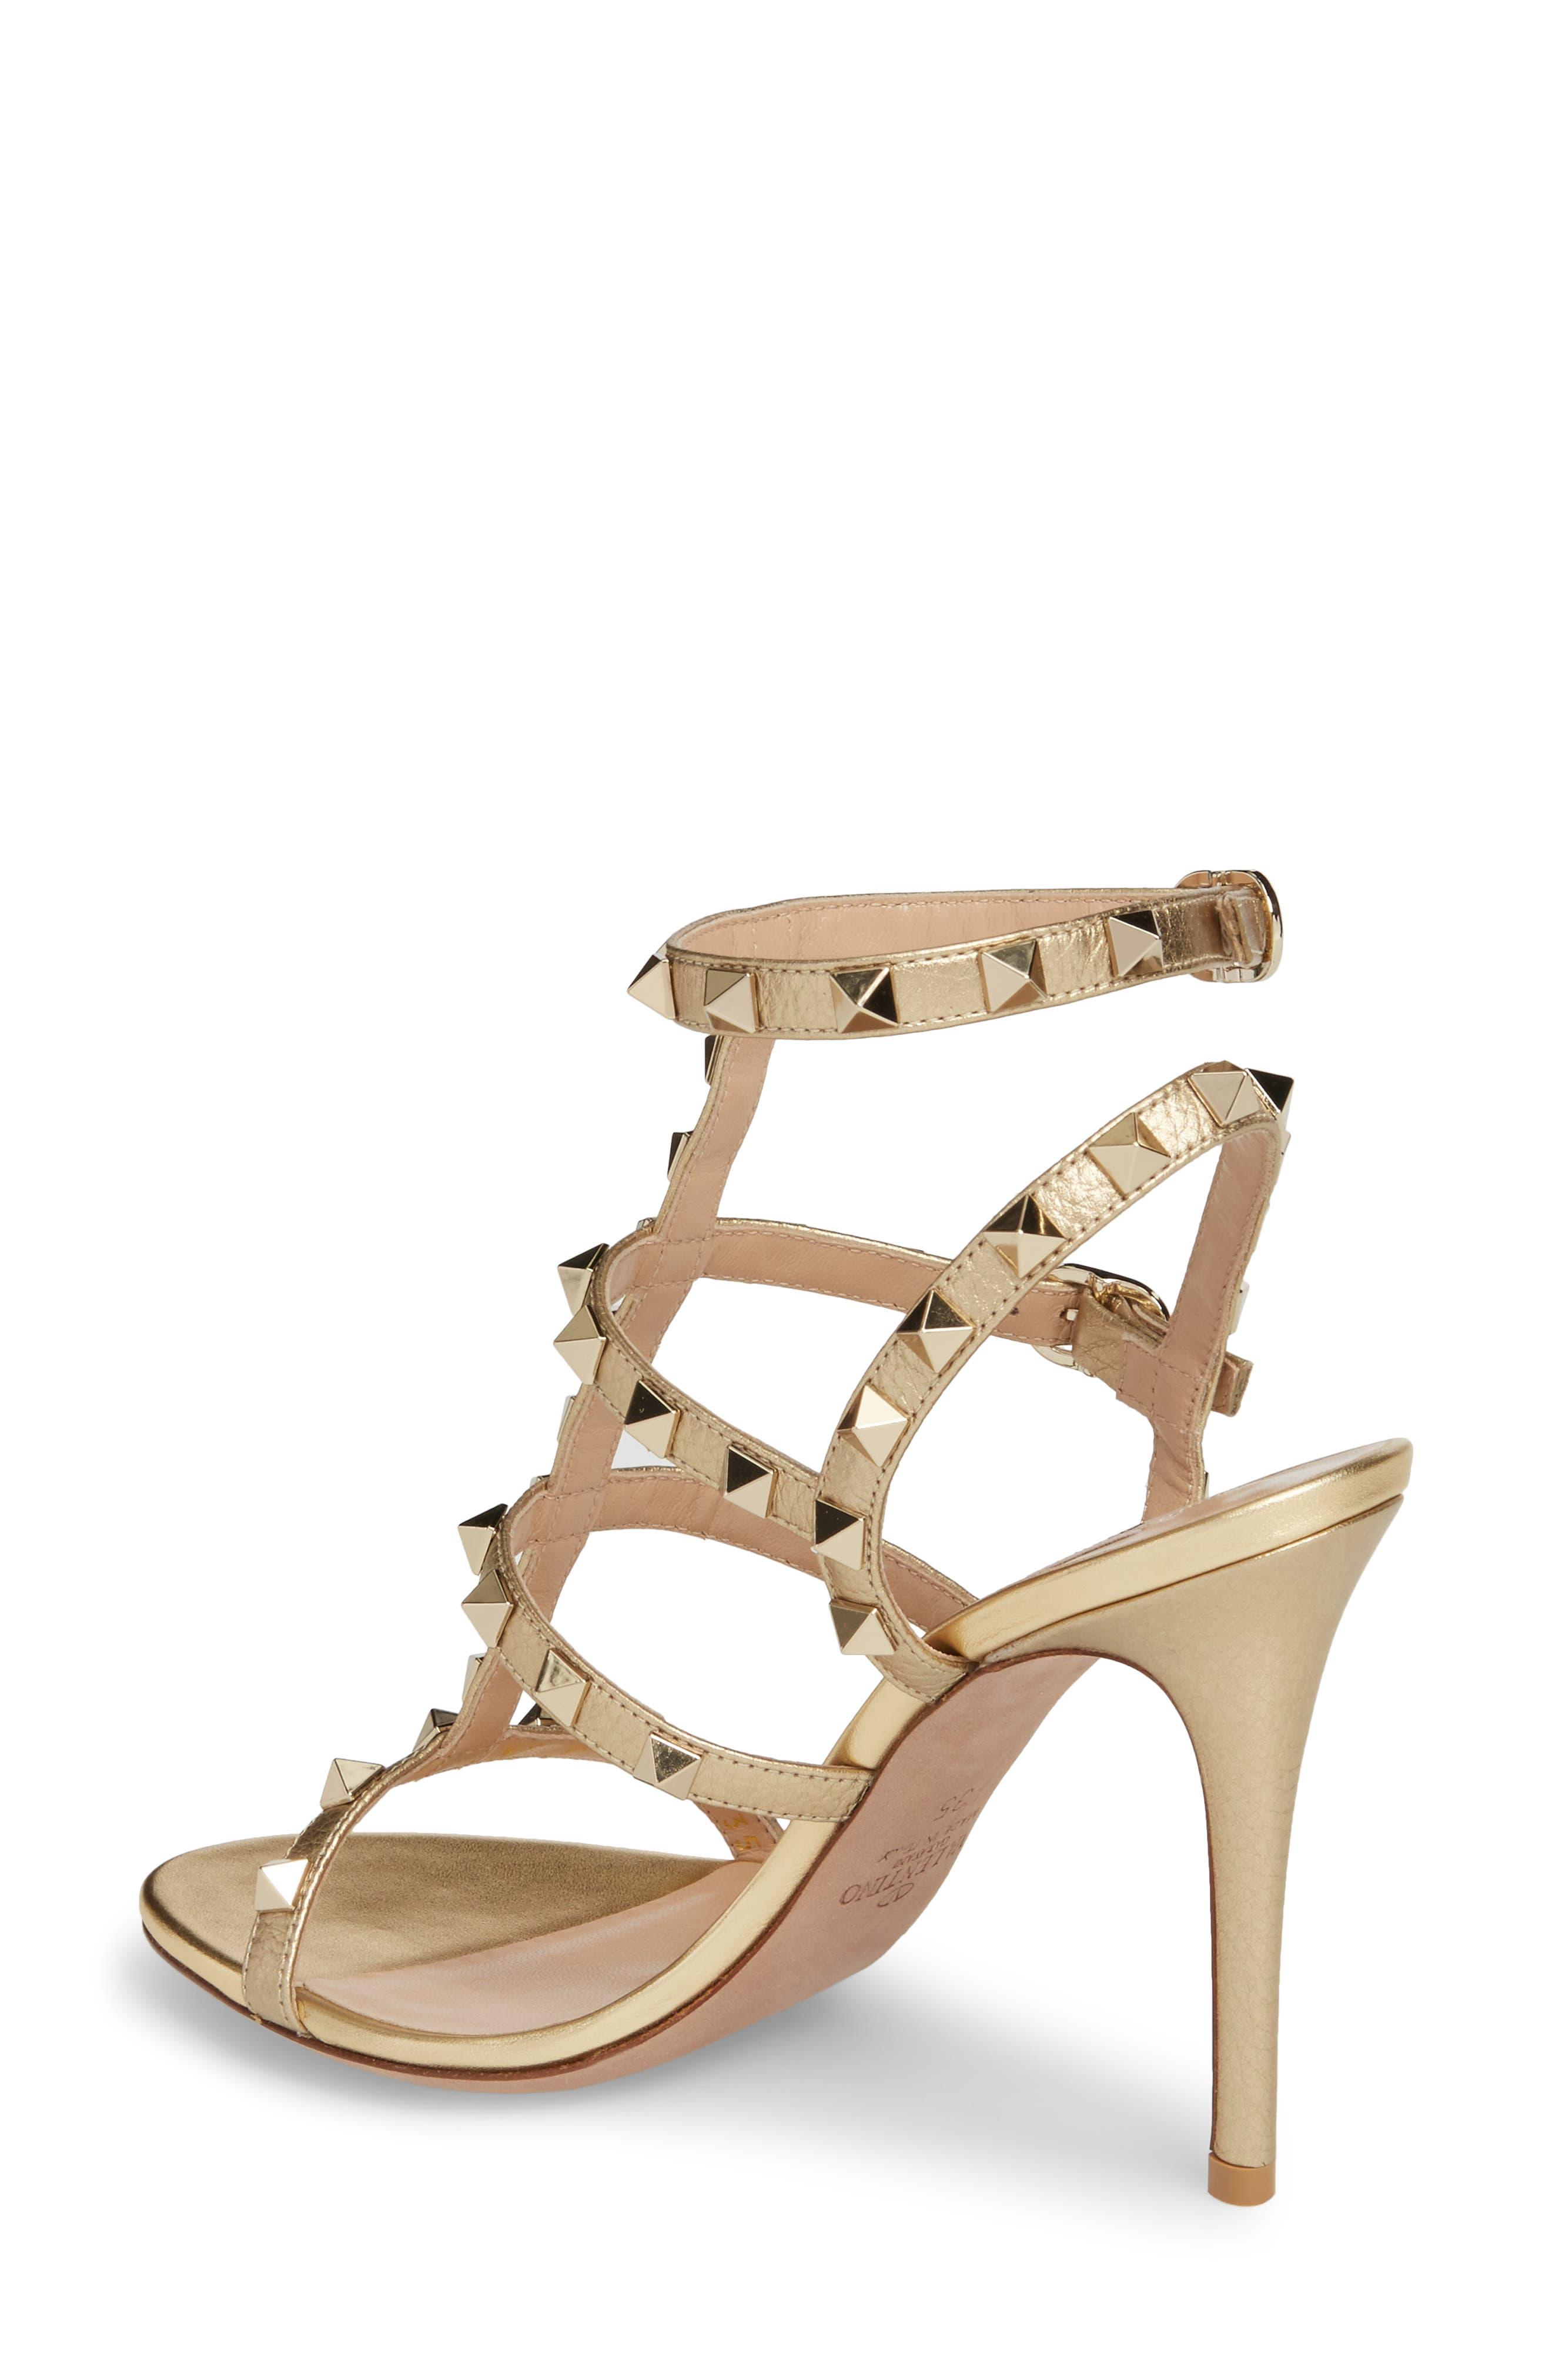 VALENTINO GARAVANI, Rockstud Metallic Ankle Strap Sandal, Alternate thumbnail 2, color, 710